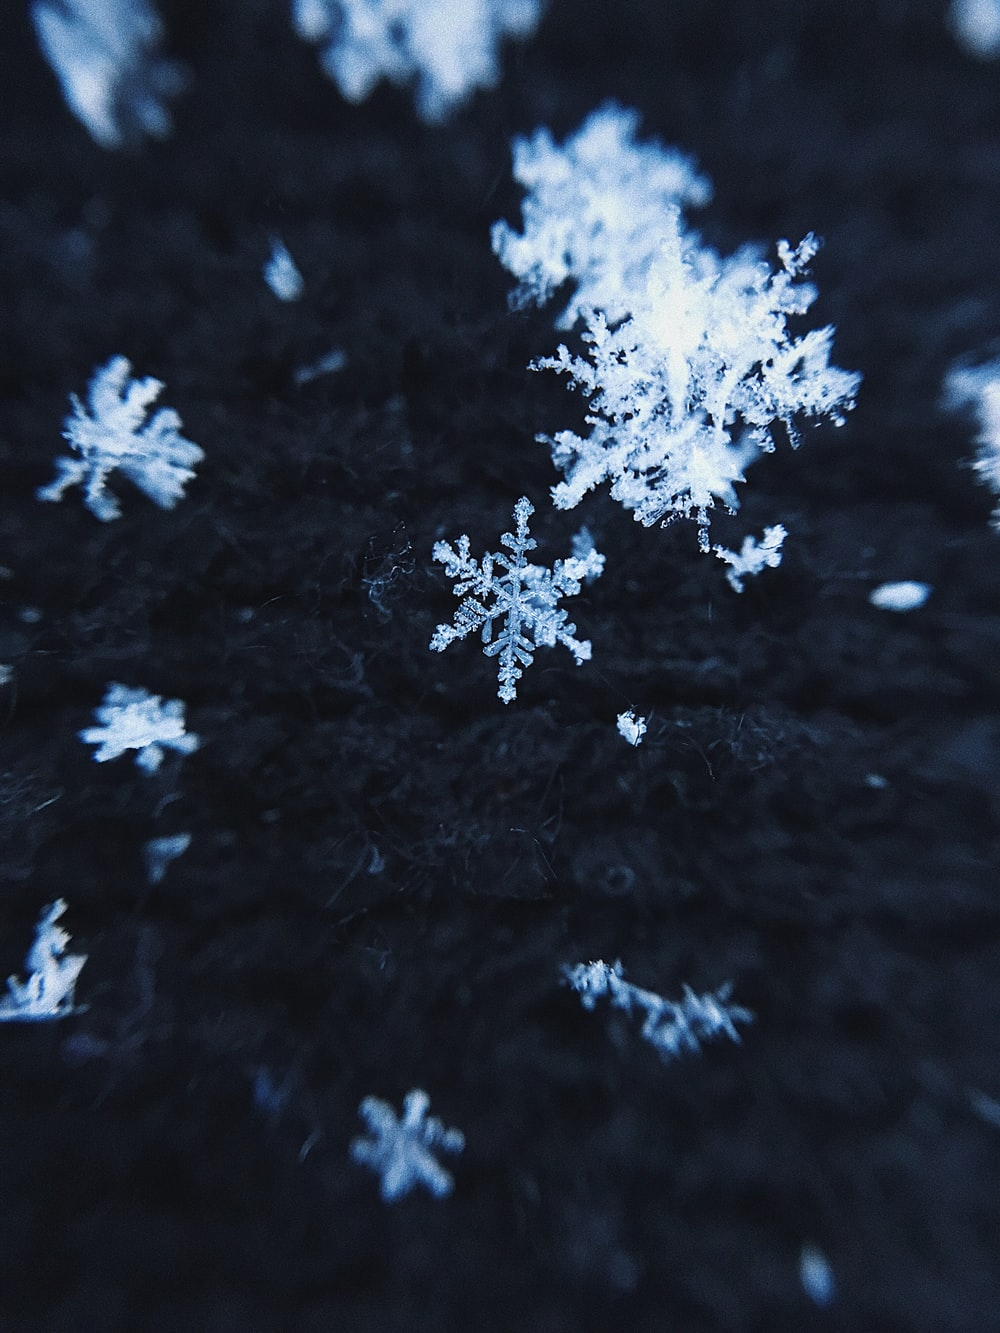 white snow on black background